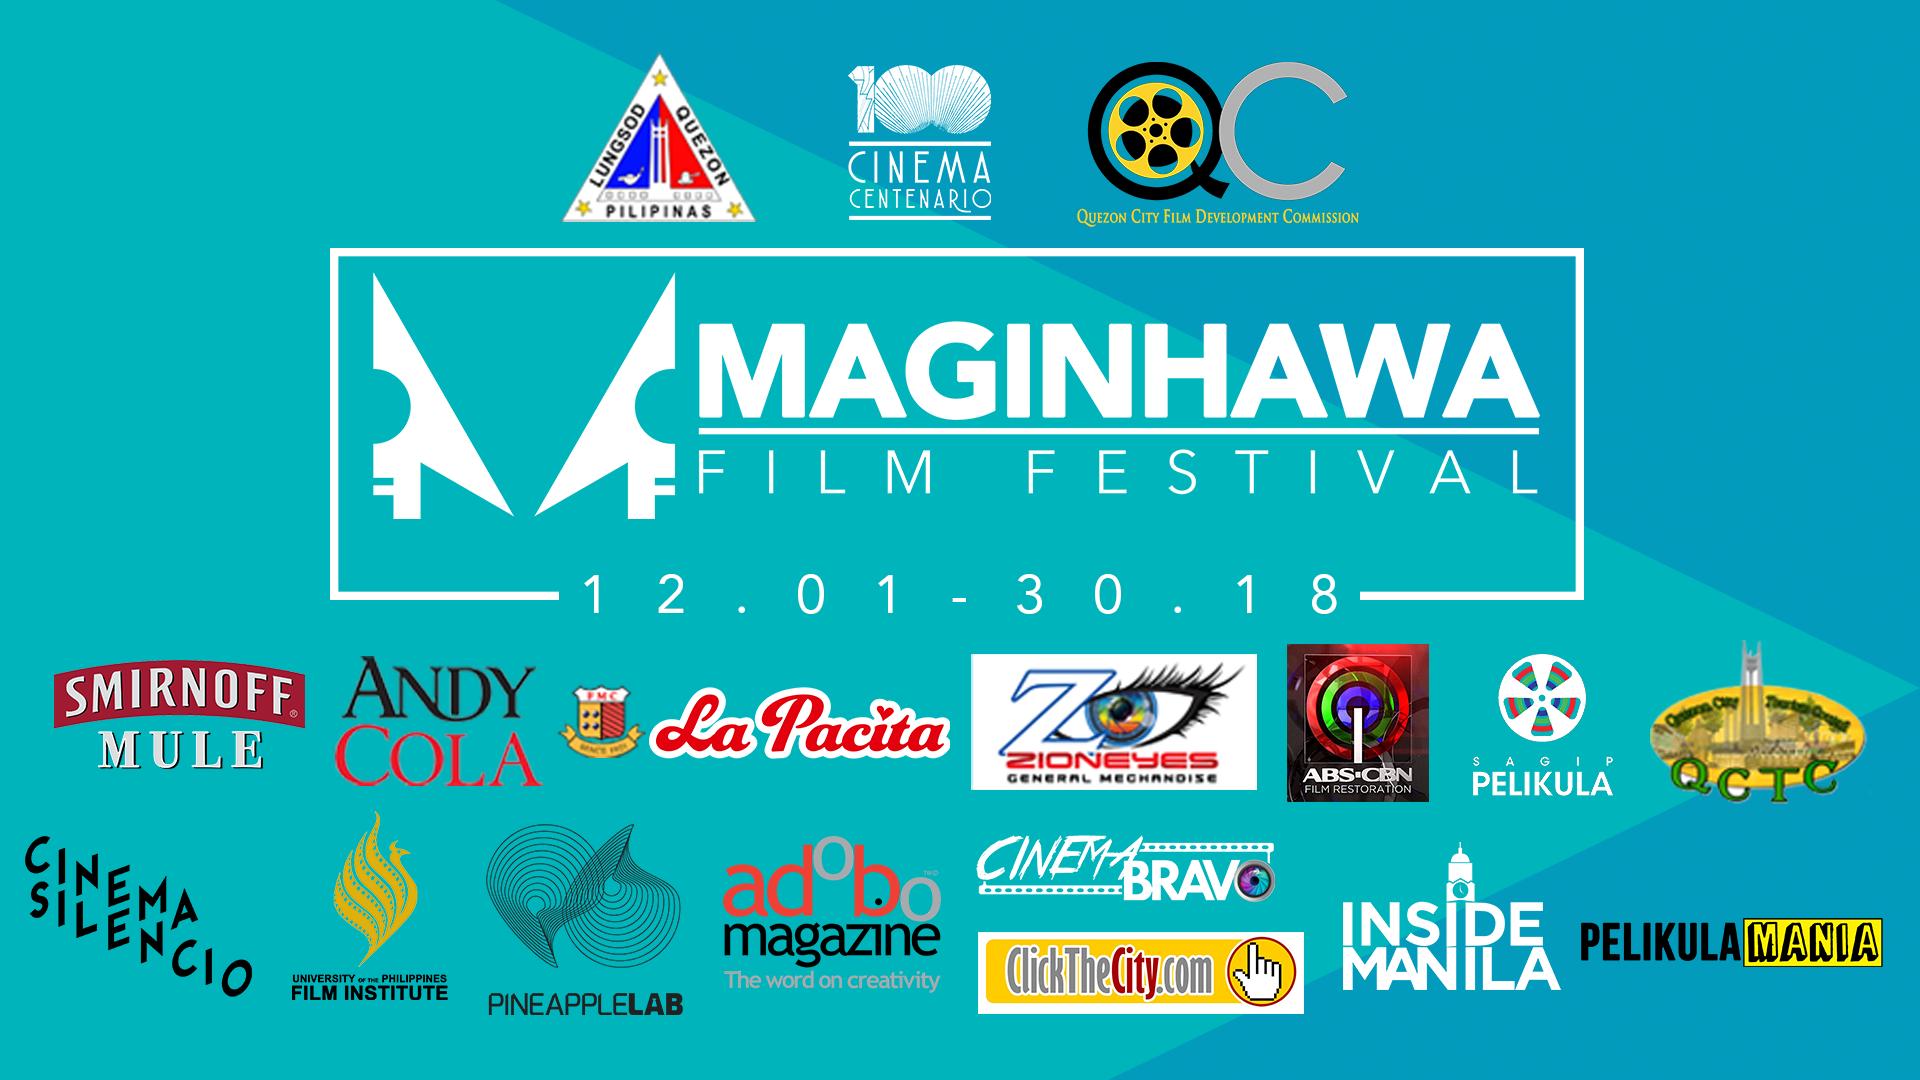 2018 Maginhawa Film Festival aarangkada na